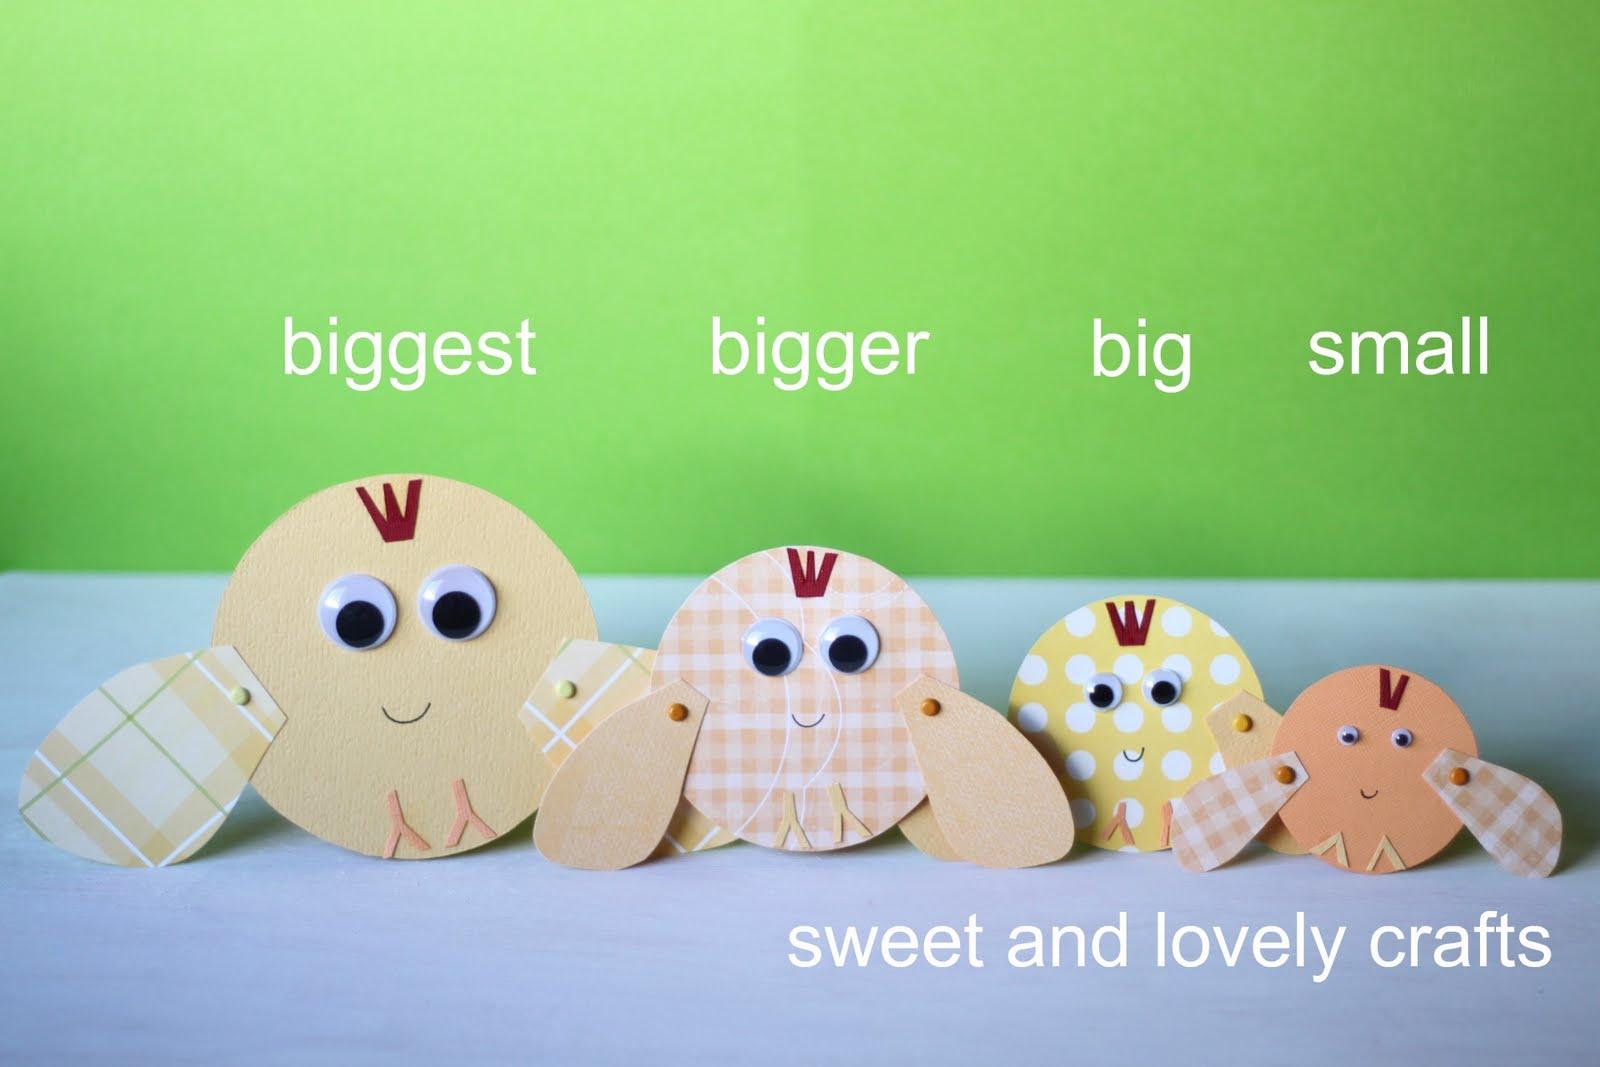 sweet and lovely crafts: big, bigger, biggest chicks